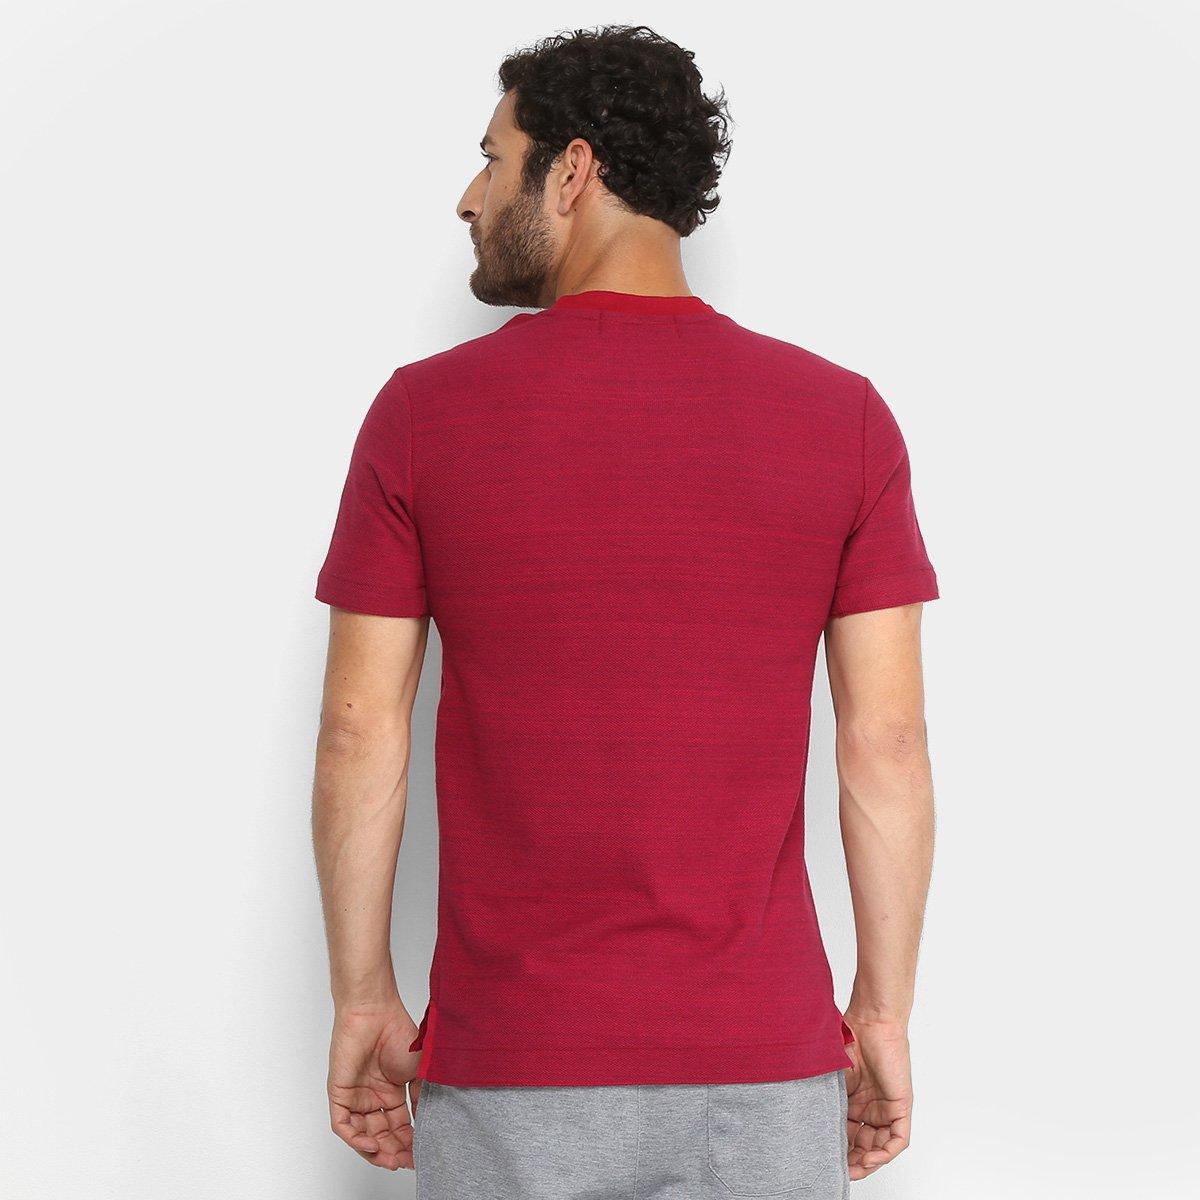 Camisa Polo Barcelona Grand Slam Nike Masculina - Compre Agora ... 2e35954110197